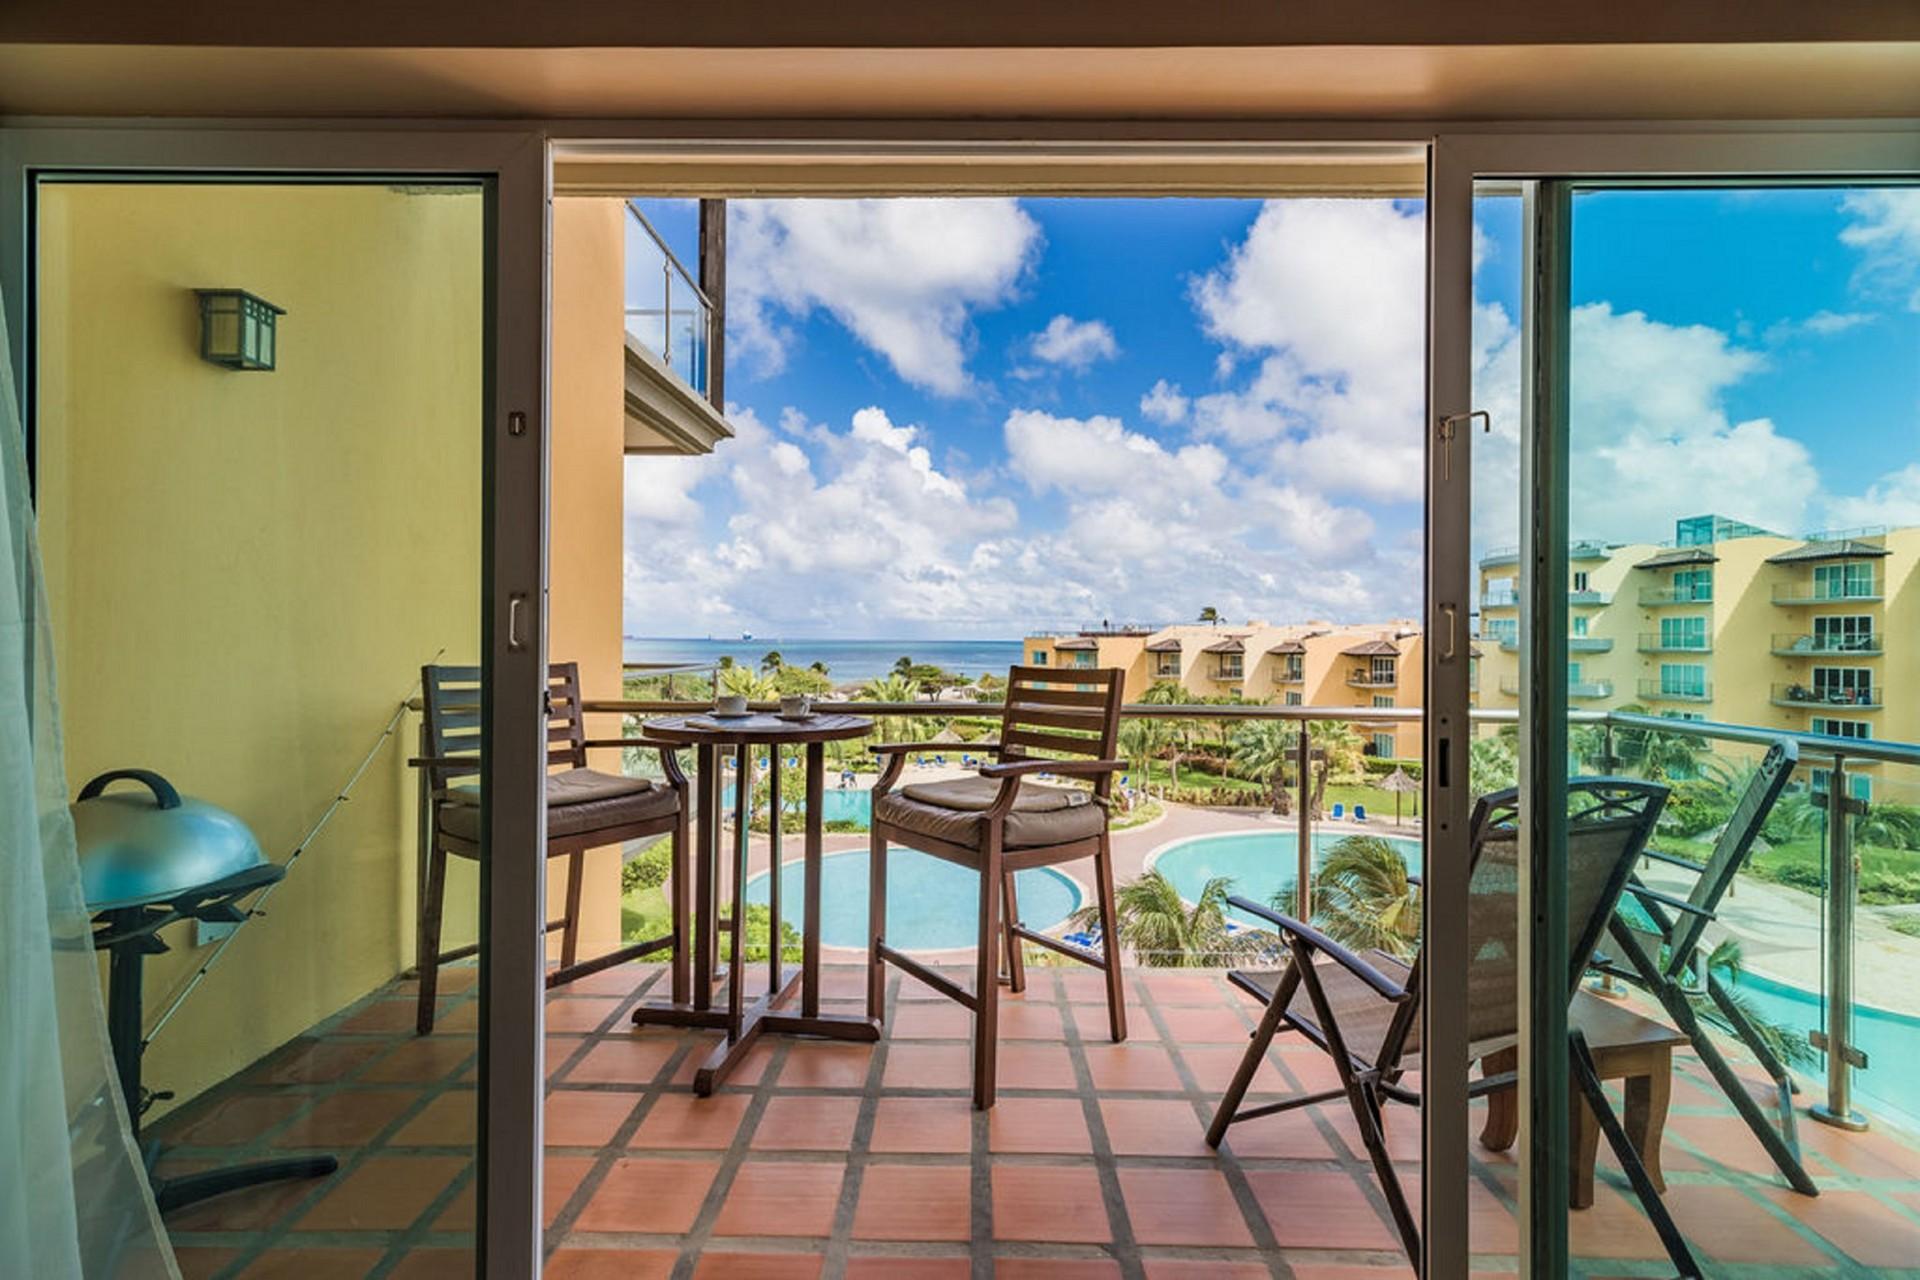 Oceania 432- Large 1 bedroom Ocean Front Condo w amazing views photo 1